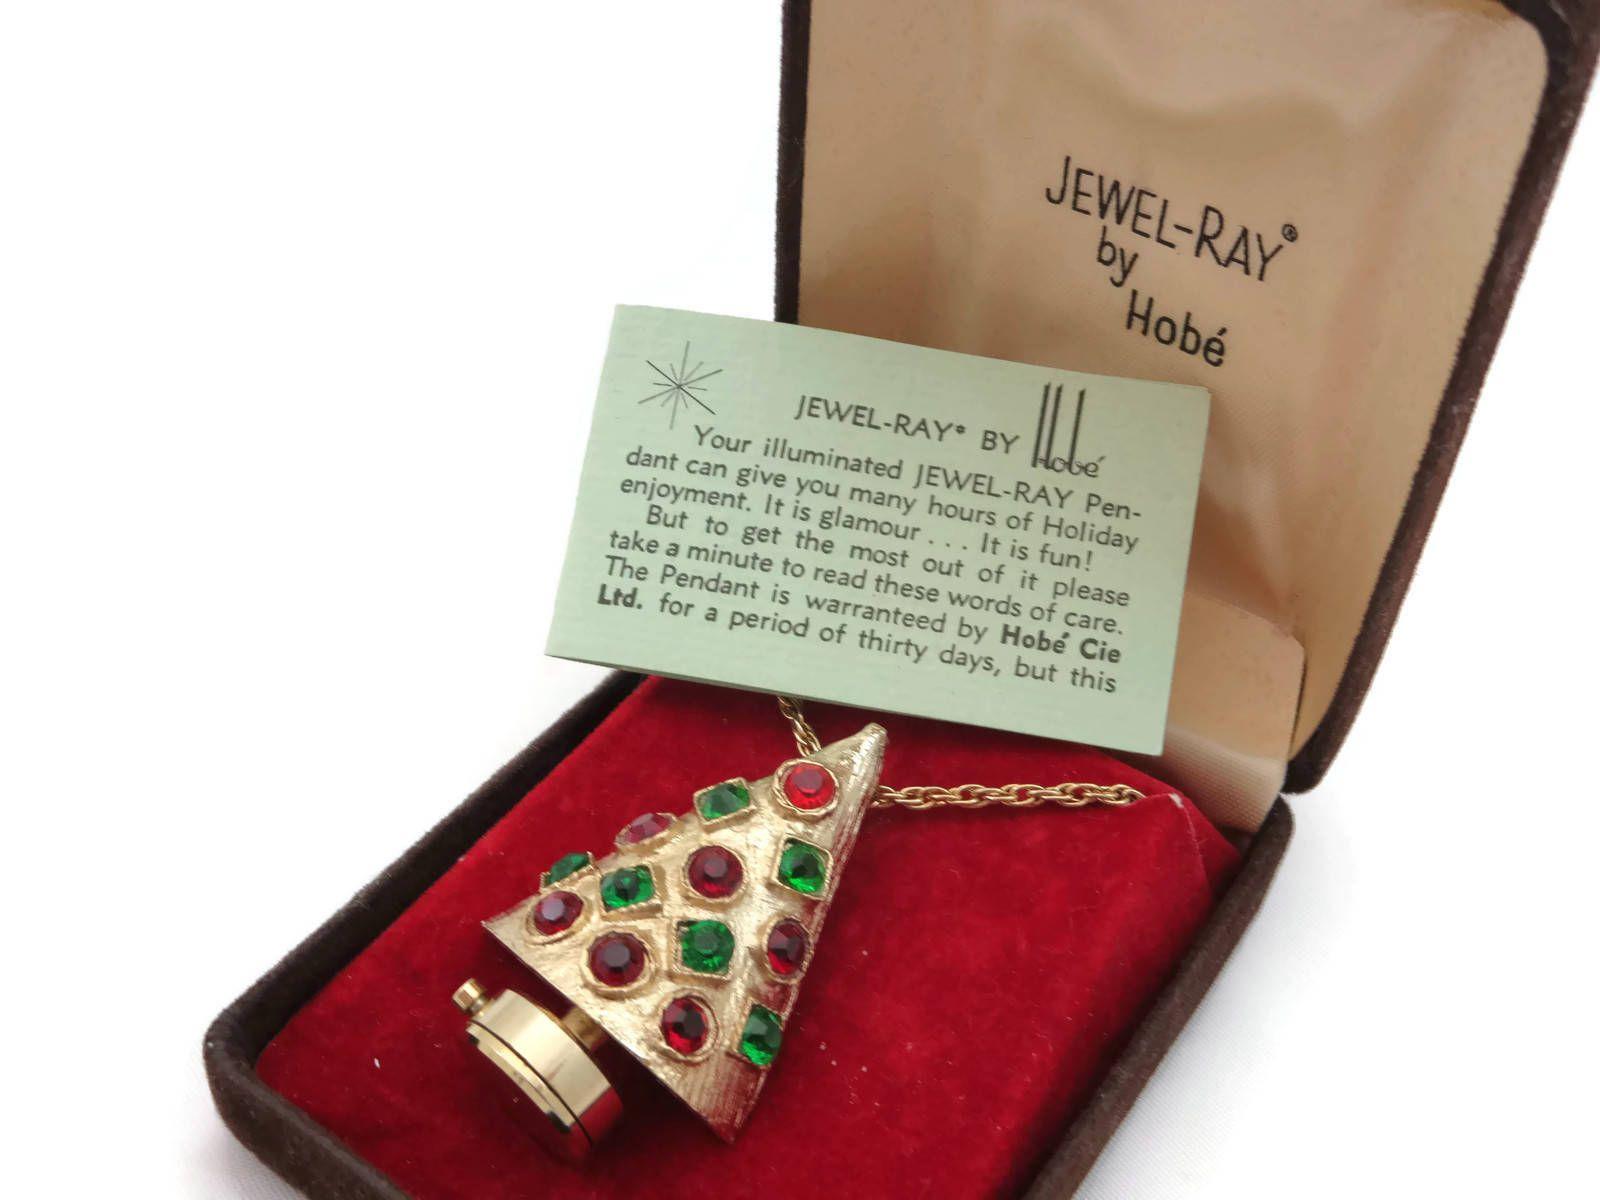 Christmas Tree Necklace Pendant - Hobe Jewelry Red Green Rhinestones ...